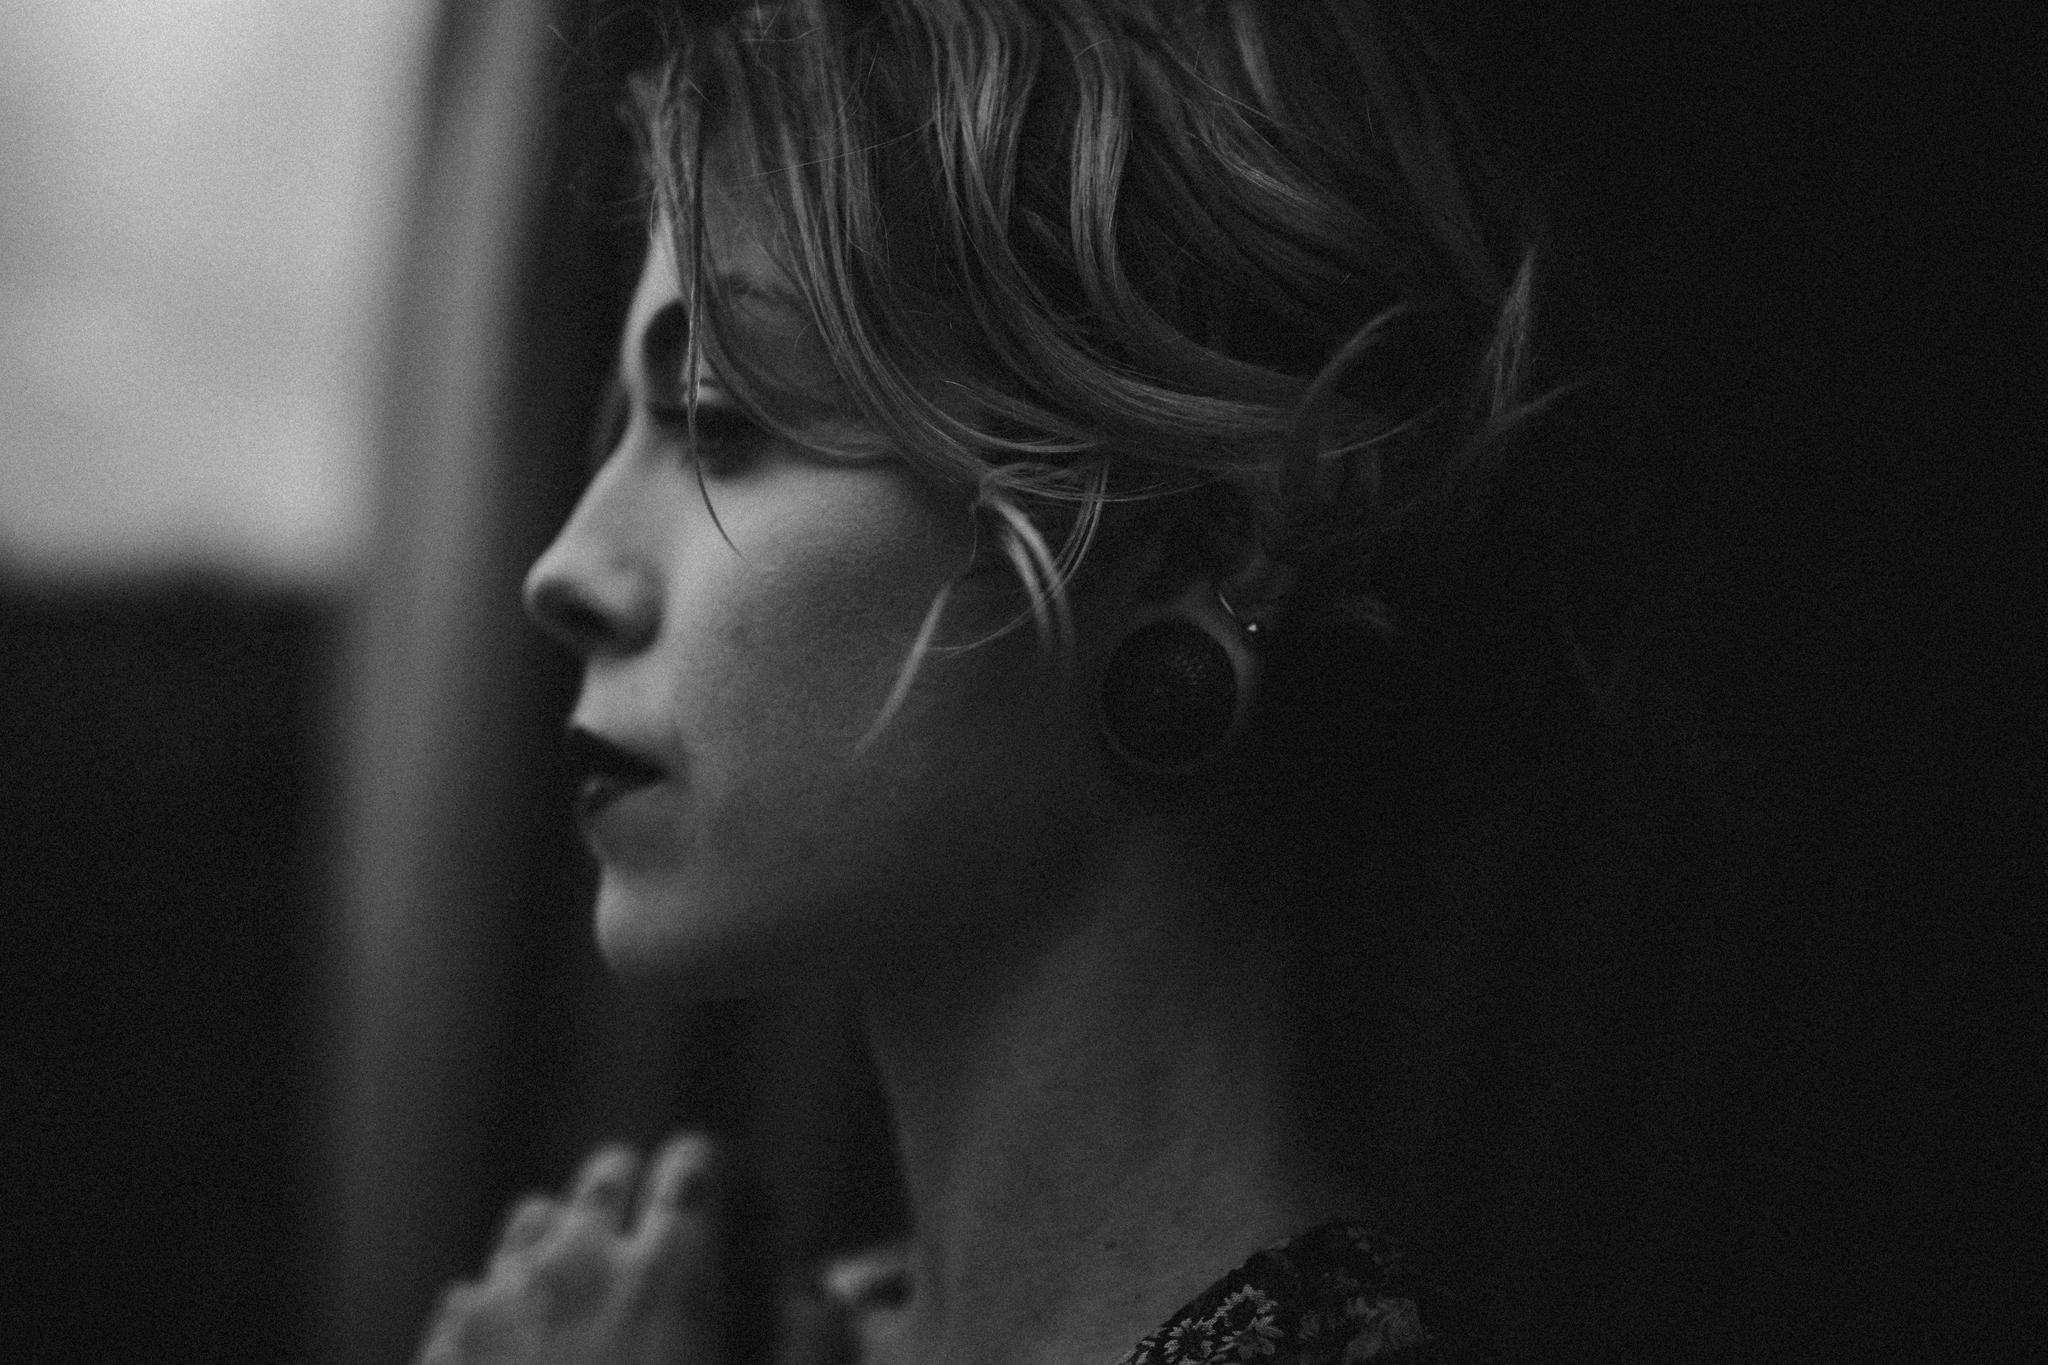 Jess-rioux-2017-197fb.jpg